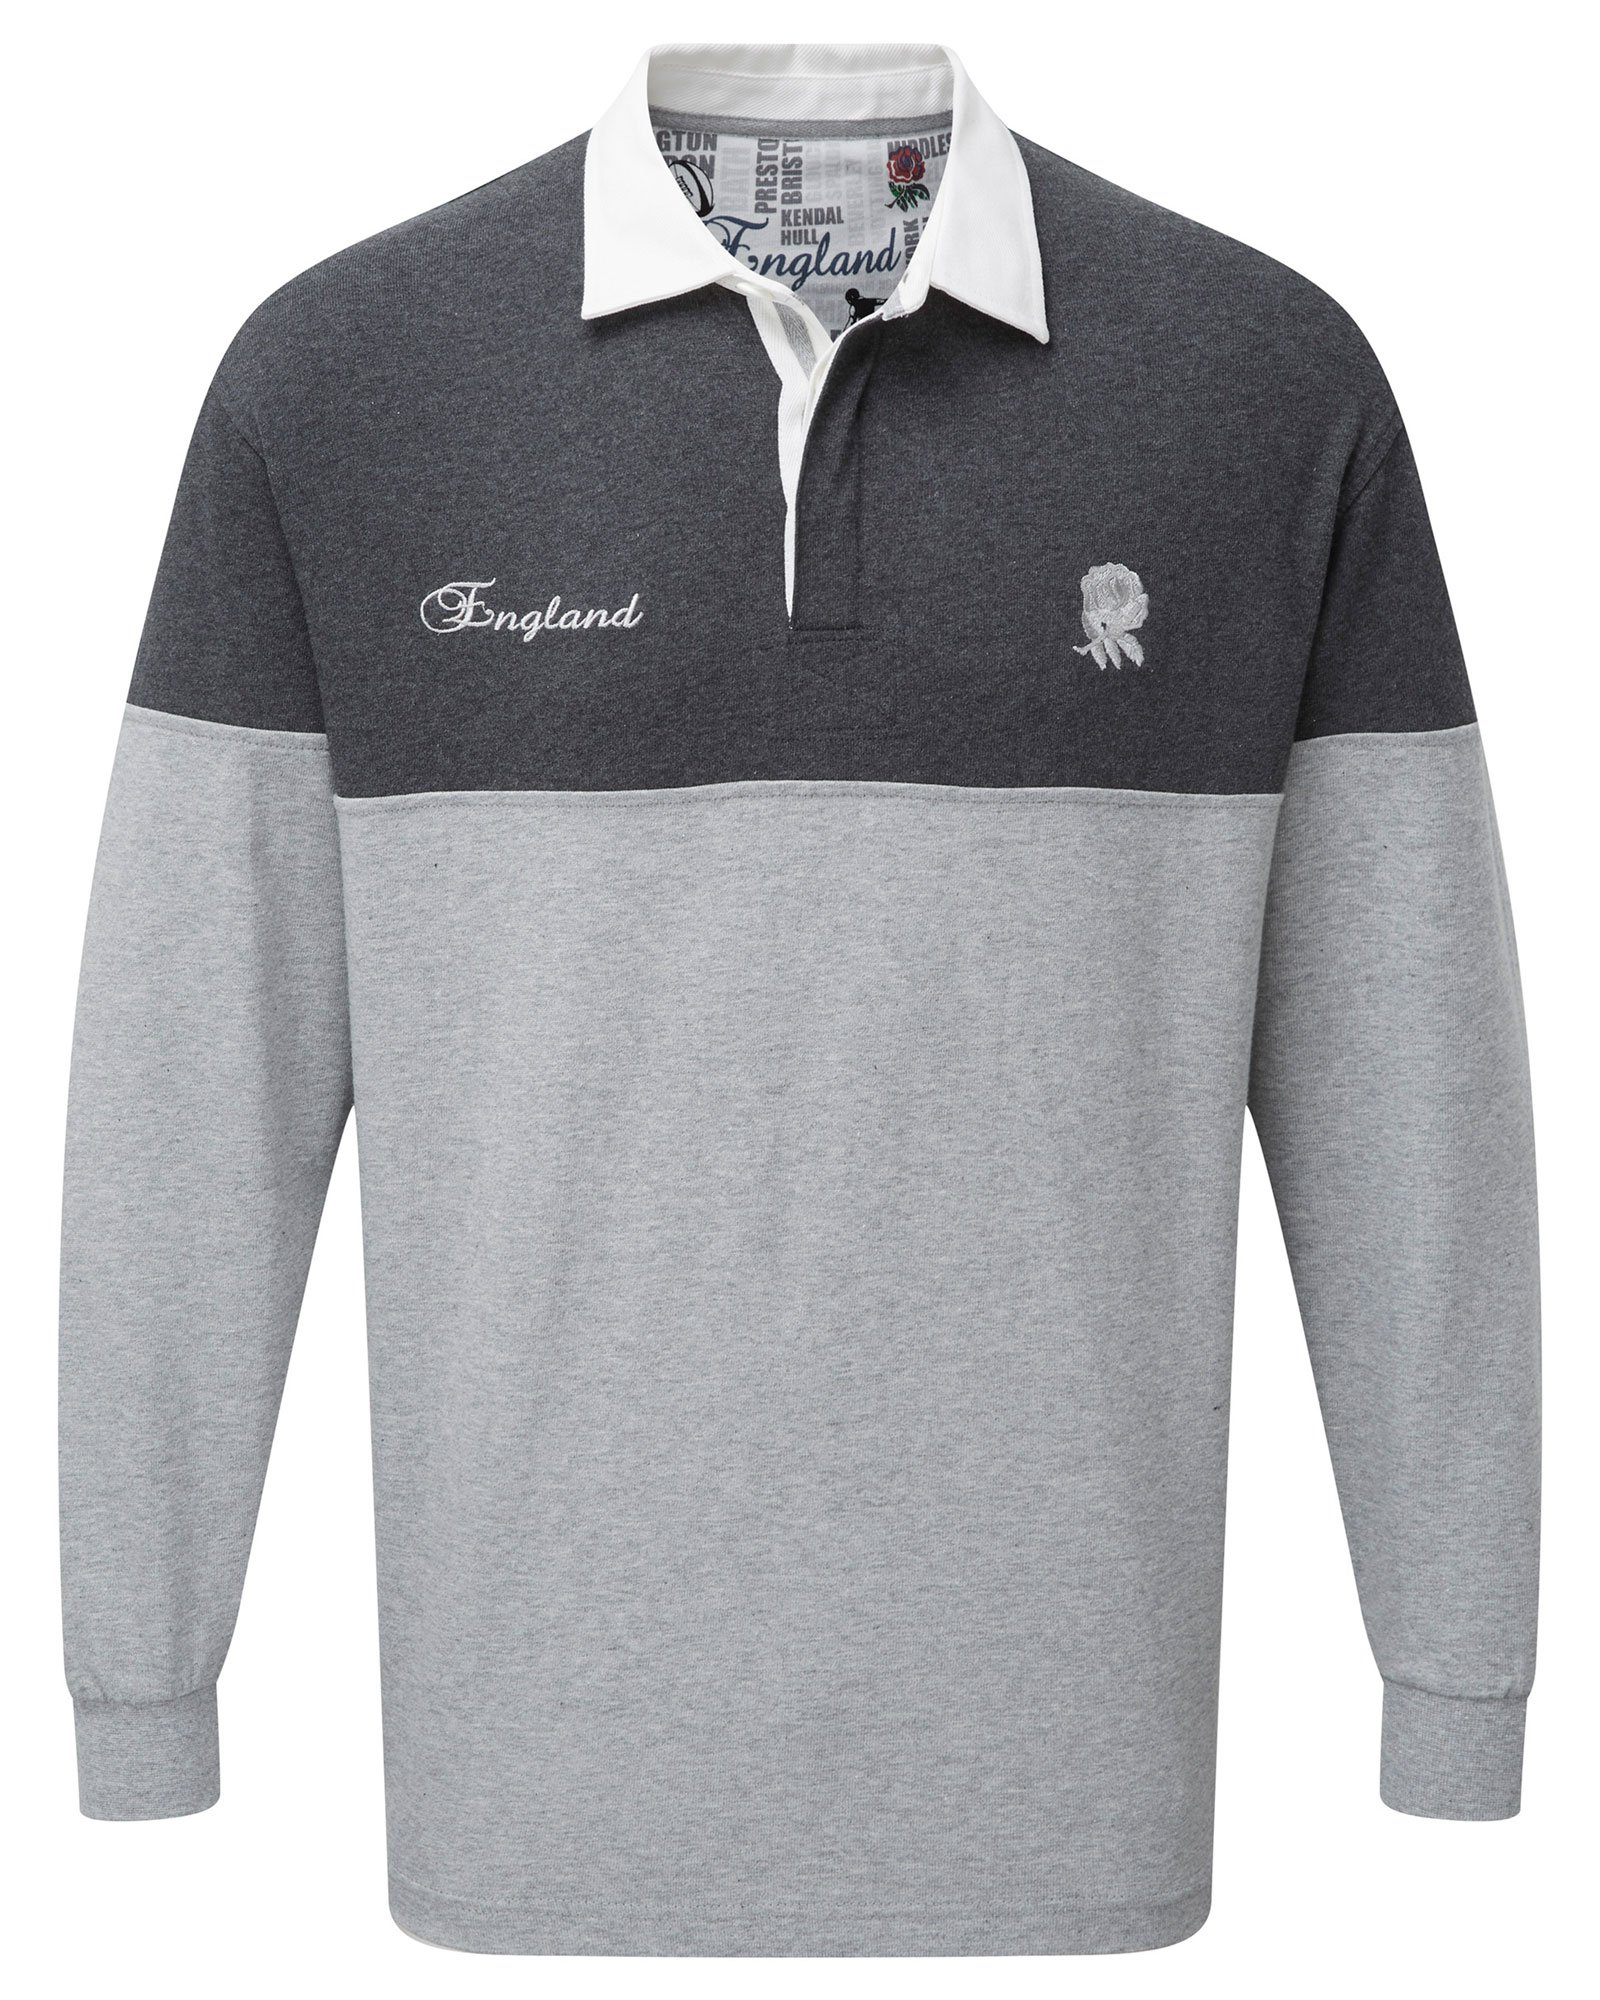 da20a5b5681 Wales Rugby Shirt Cotton Traders - DREAMWORKS